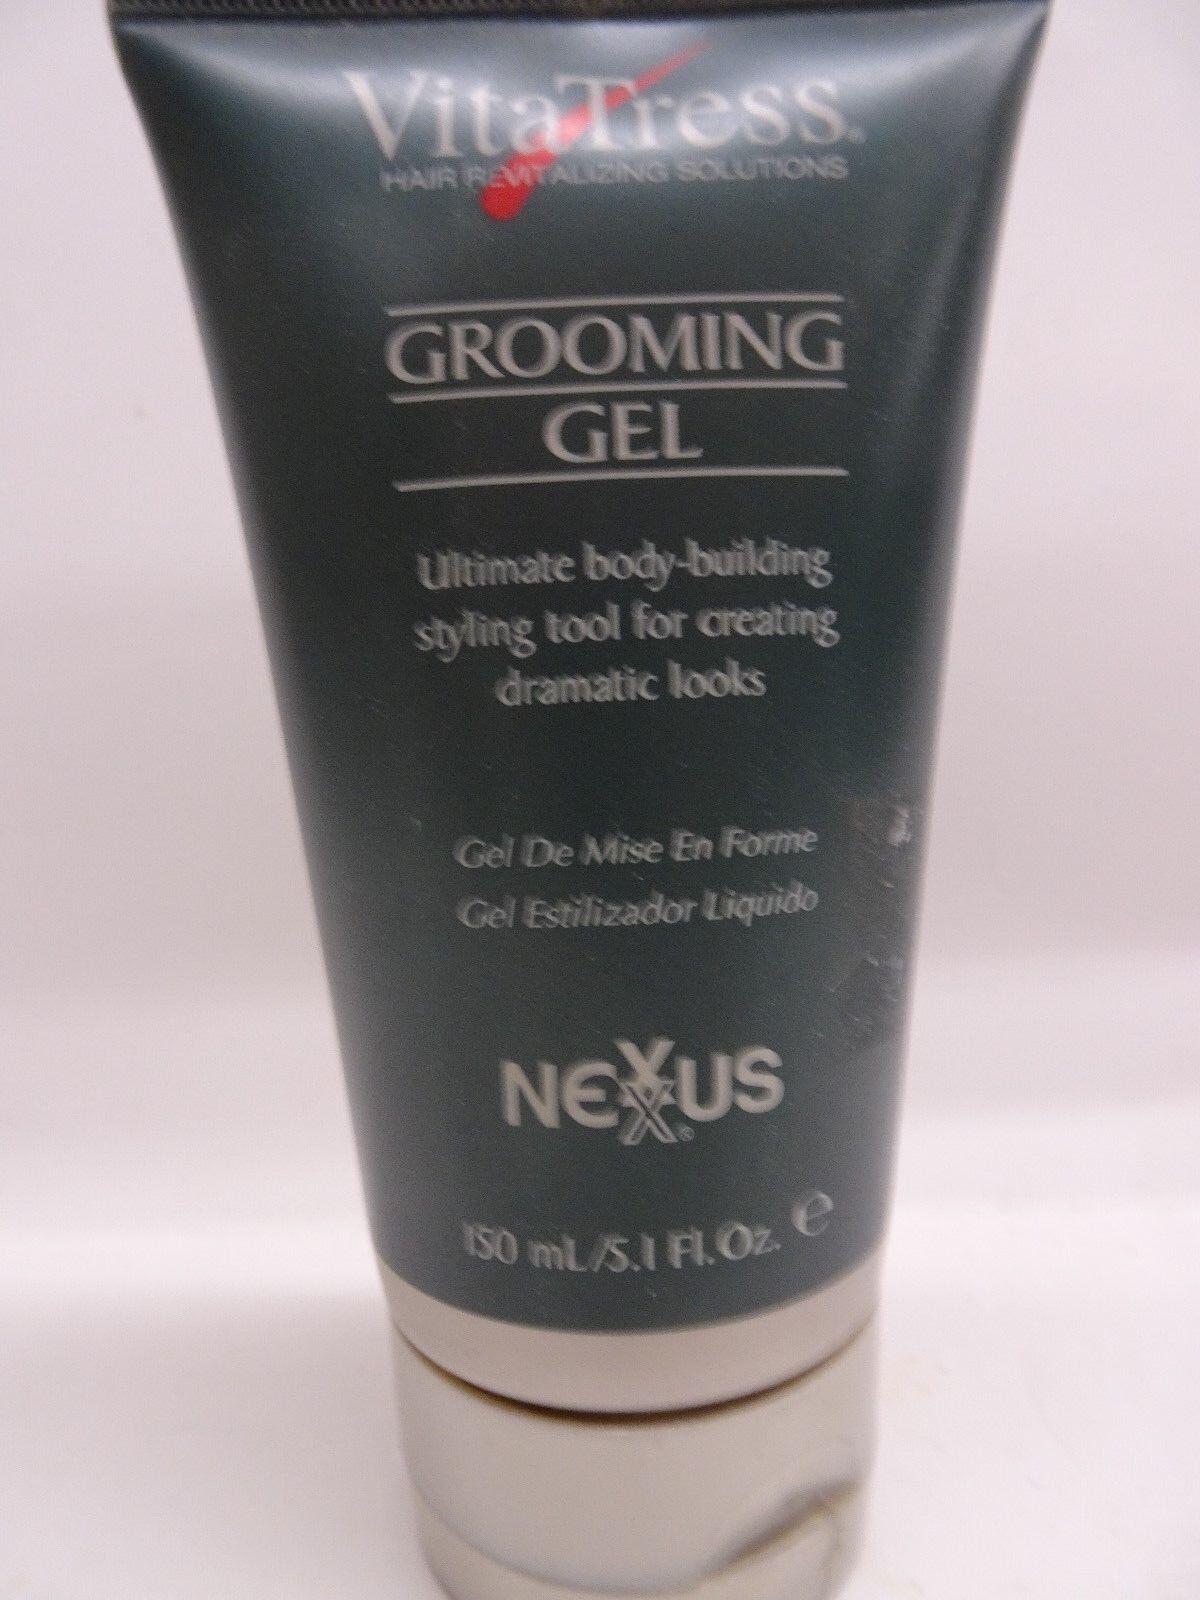 NEXXUS Vita Tress Grooming Gel 5.0 oz.